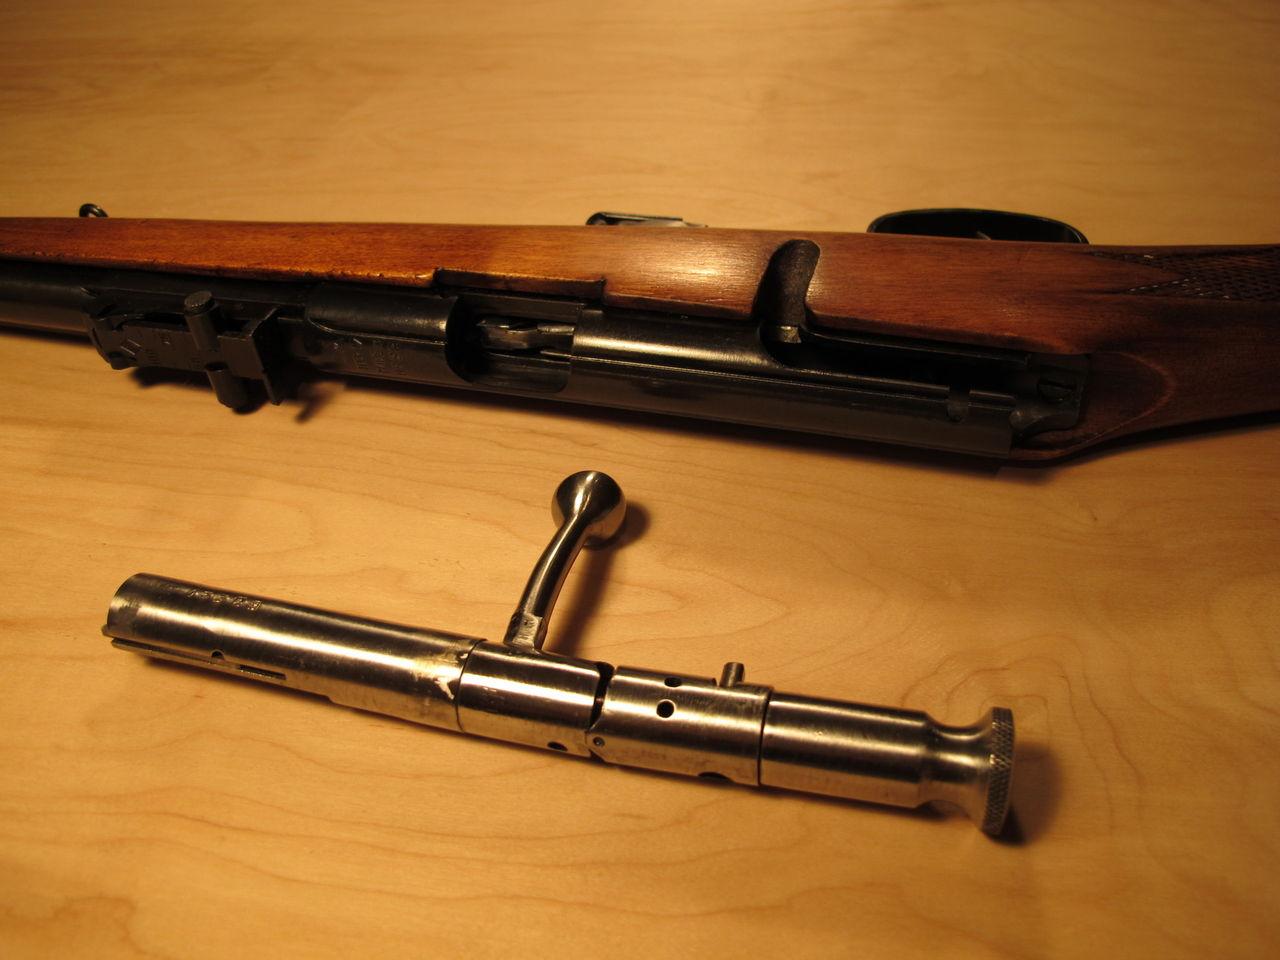 Кронштейн для рад. с дюбелем белый (7*180 мм)